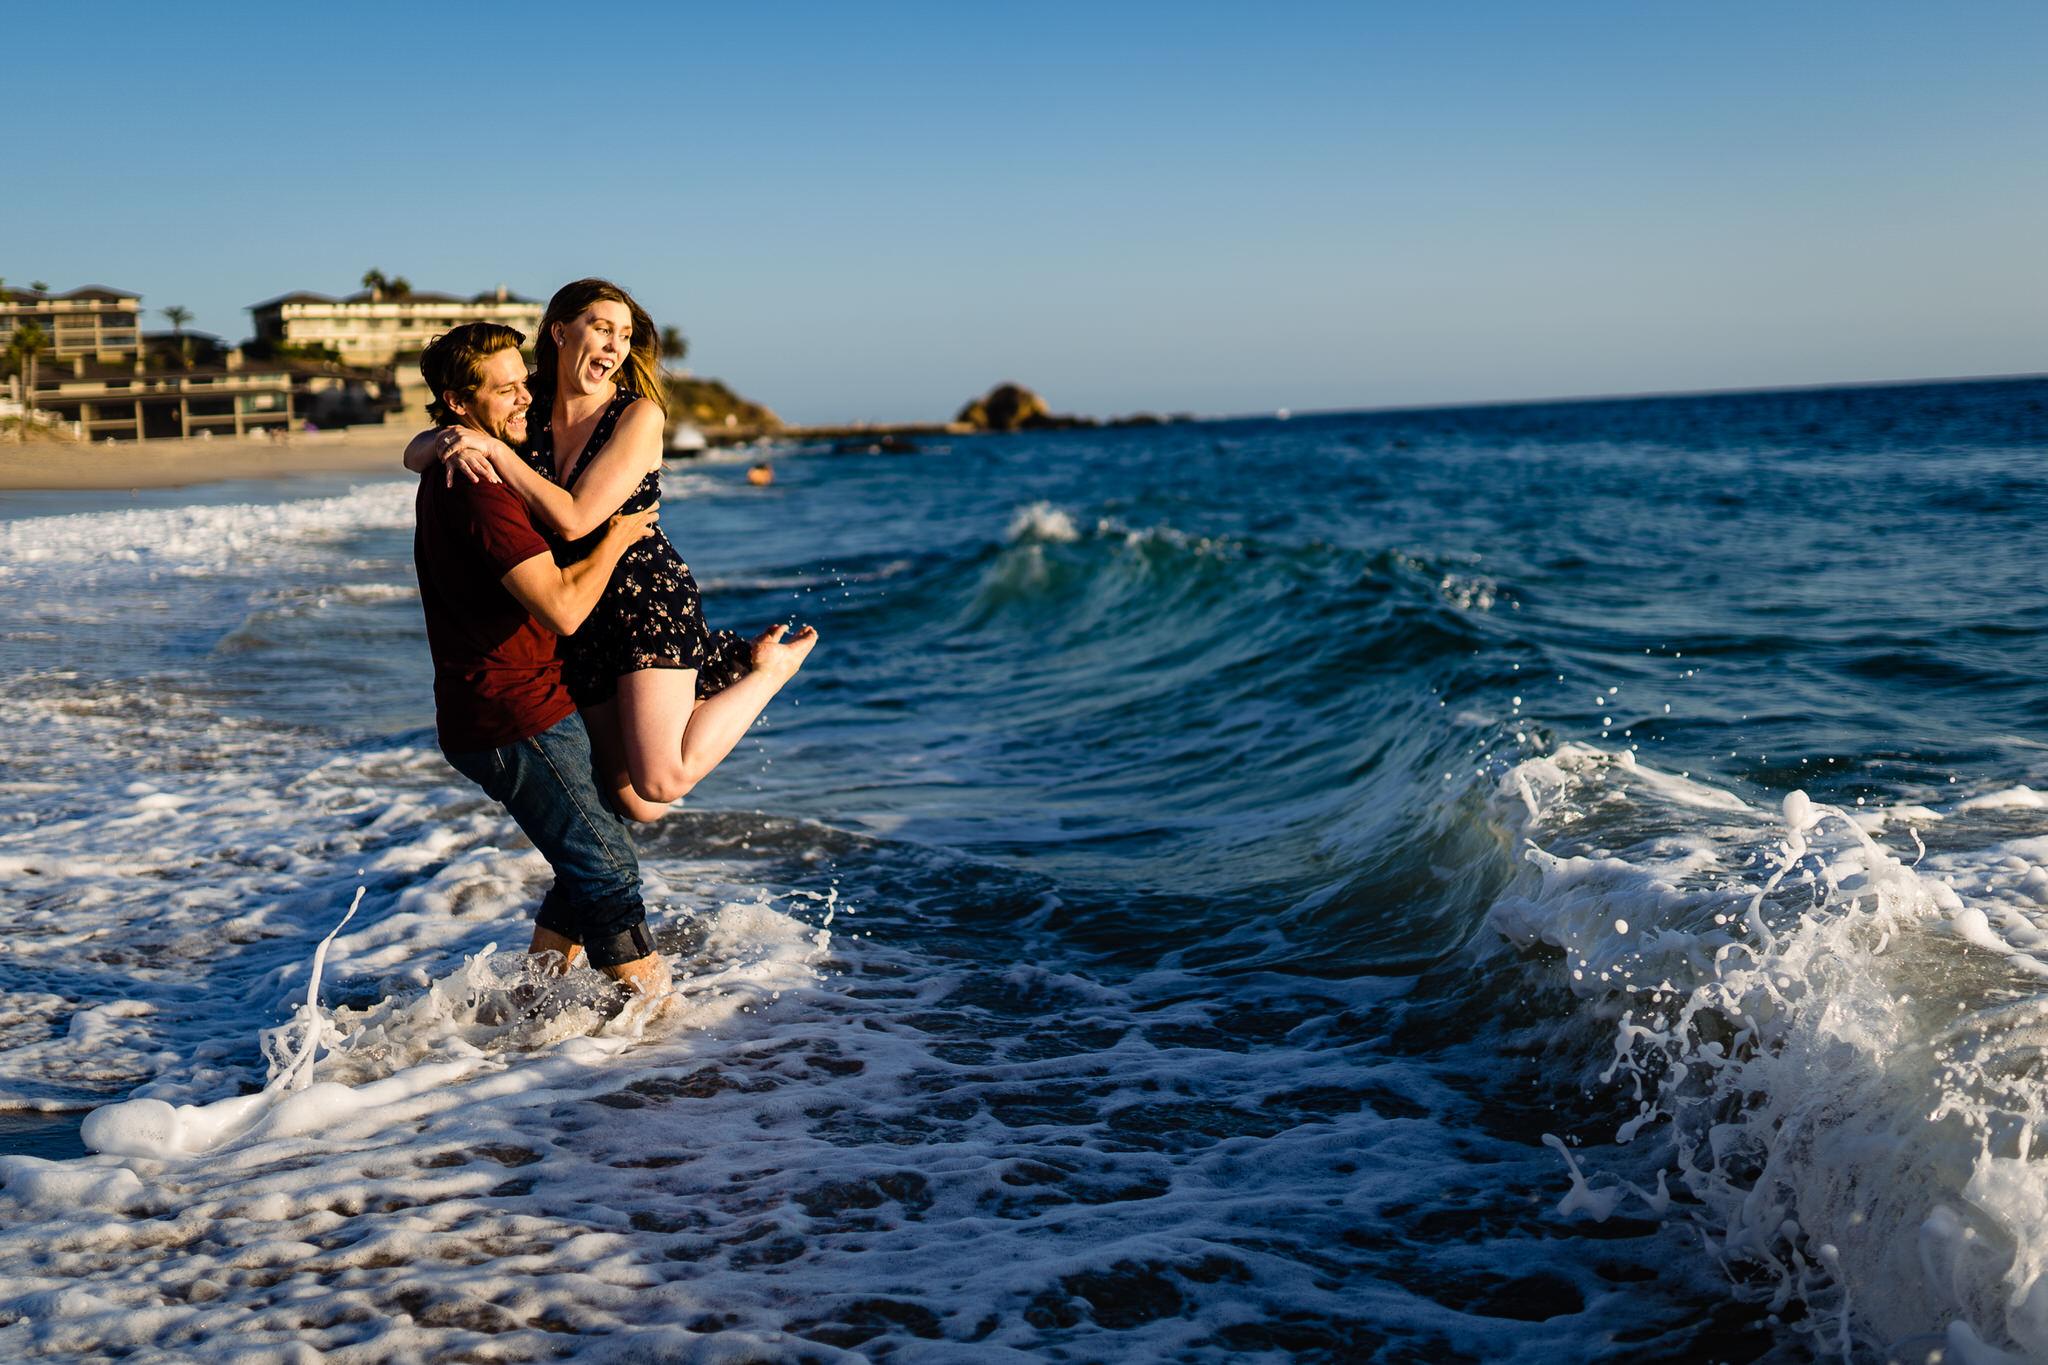 laguna beach engagement session john winters photographer best austin wedding photographer